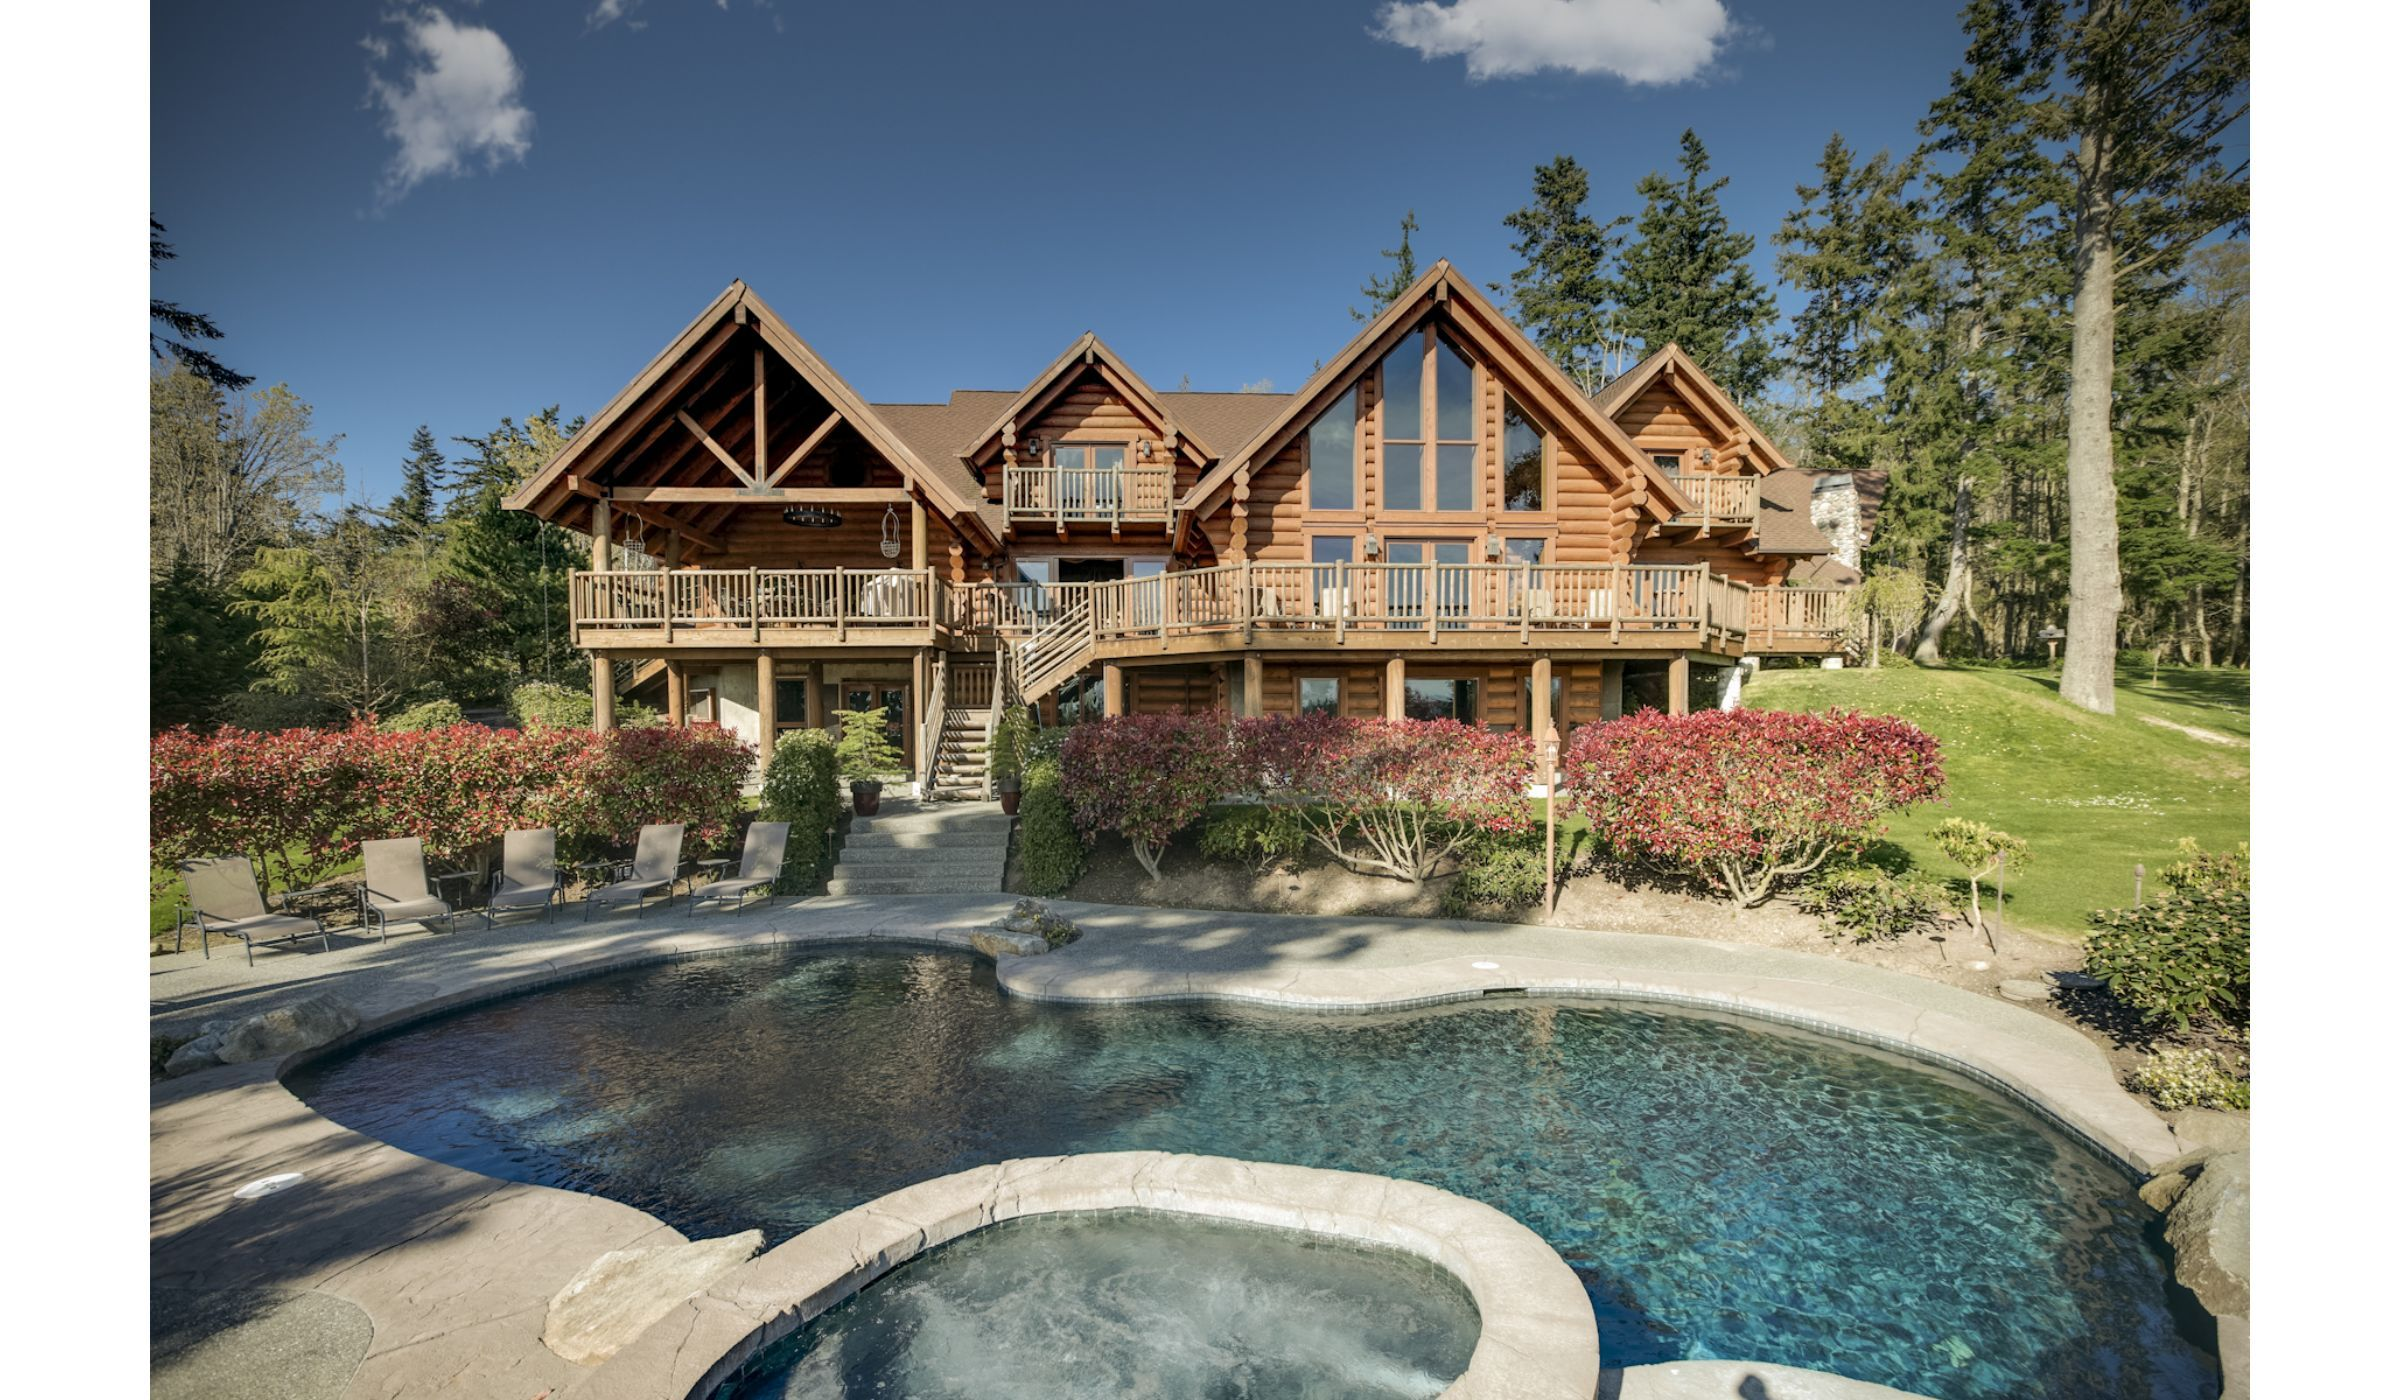 What a beautiful house Camano Island Backyard